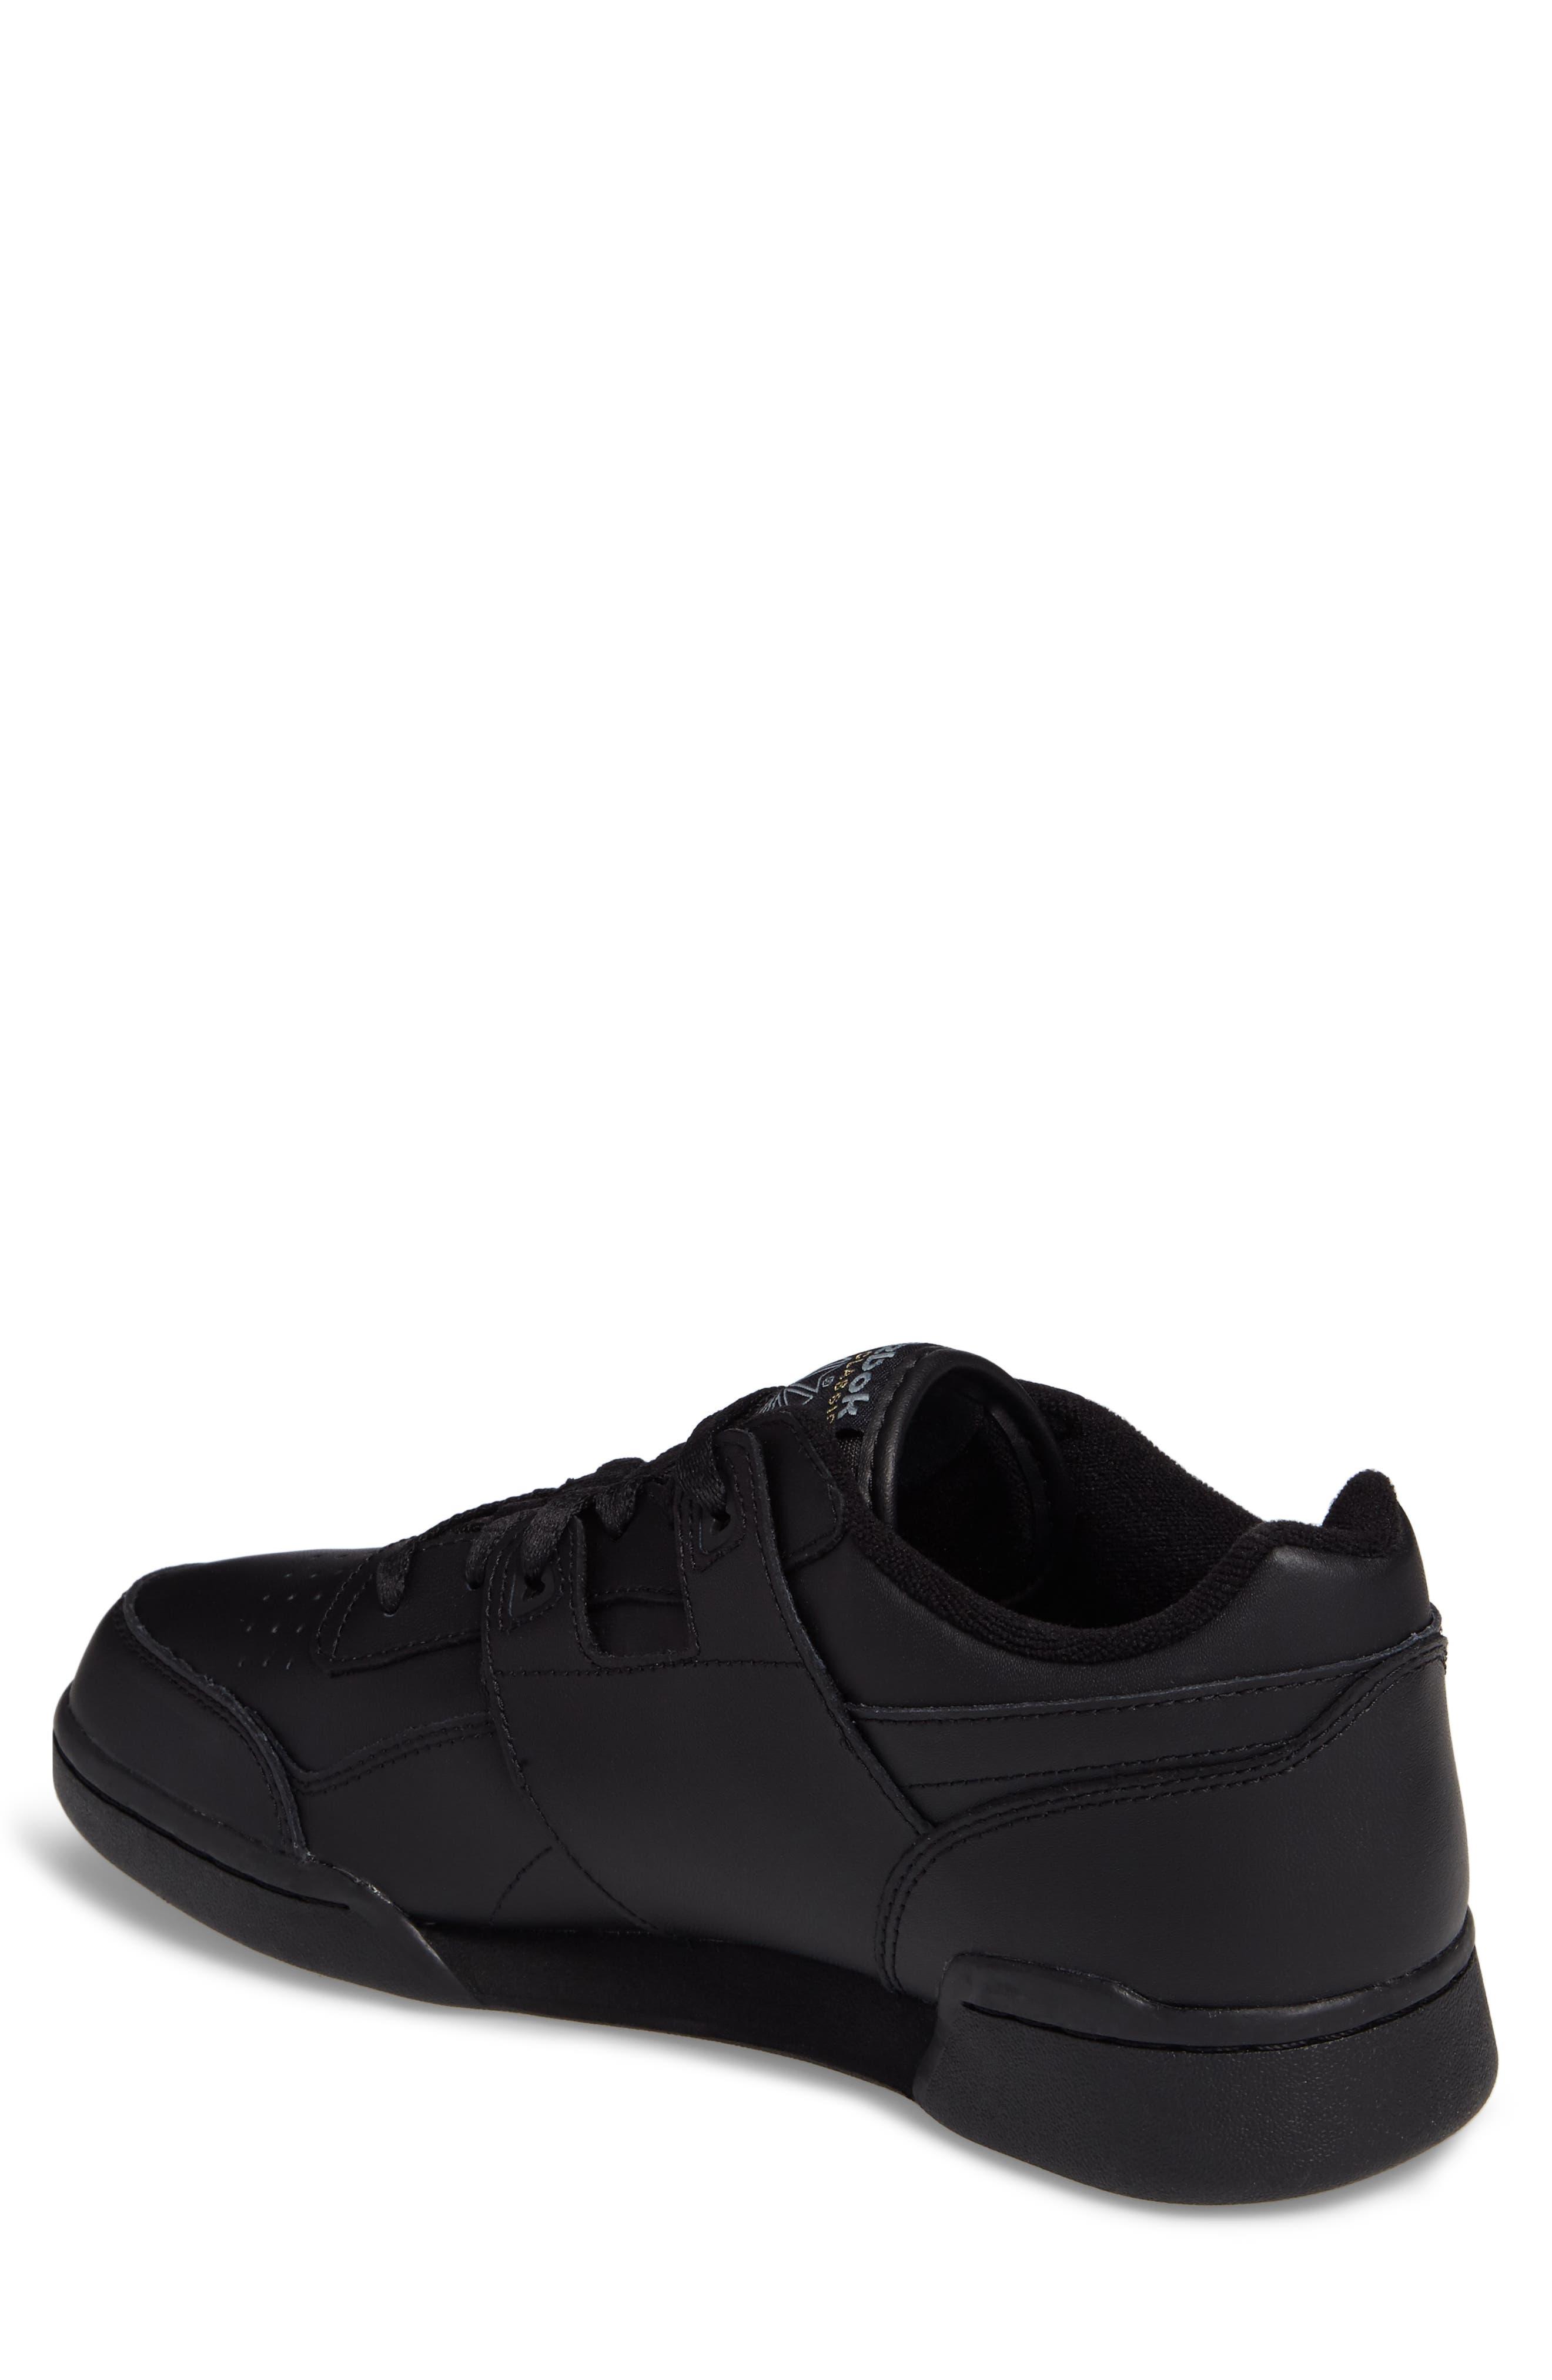 Workout Plus Sneaker,                             Alternate thumbnail 2, color,                             Black/ Charcoal